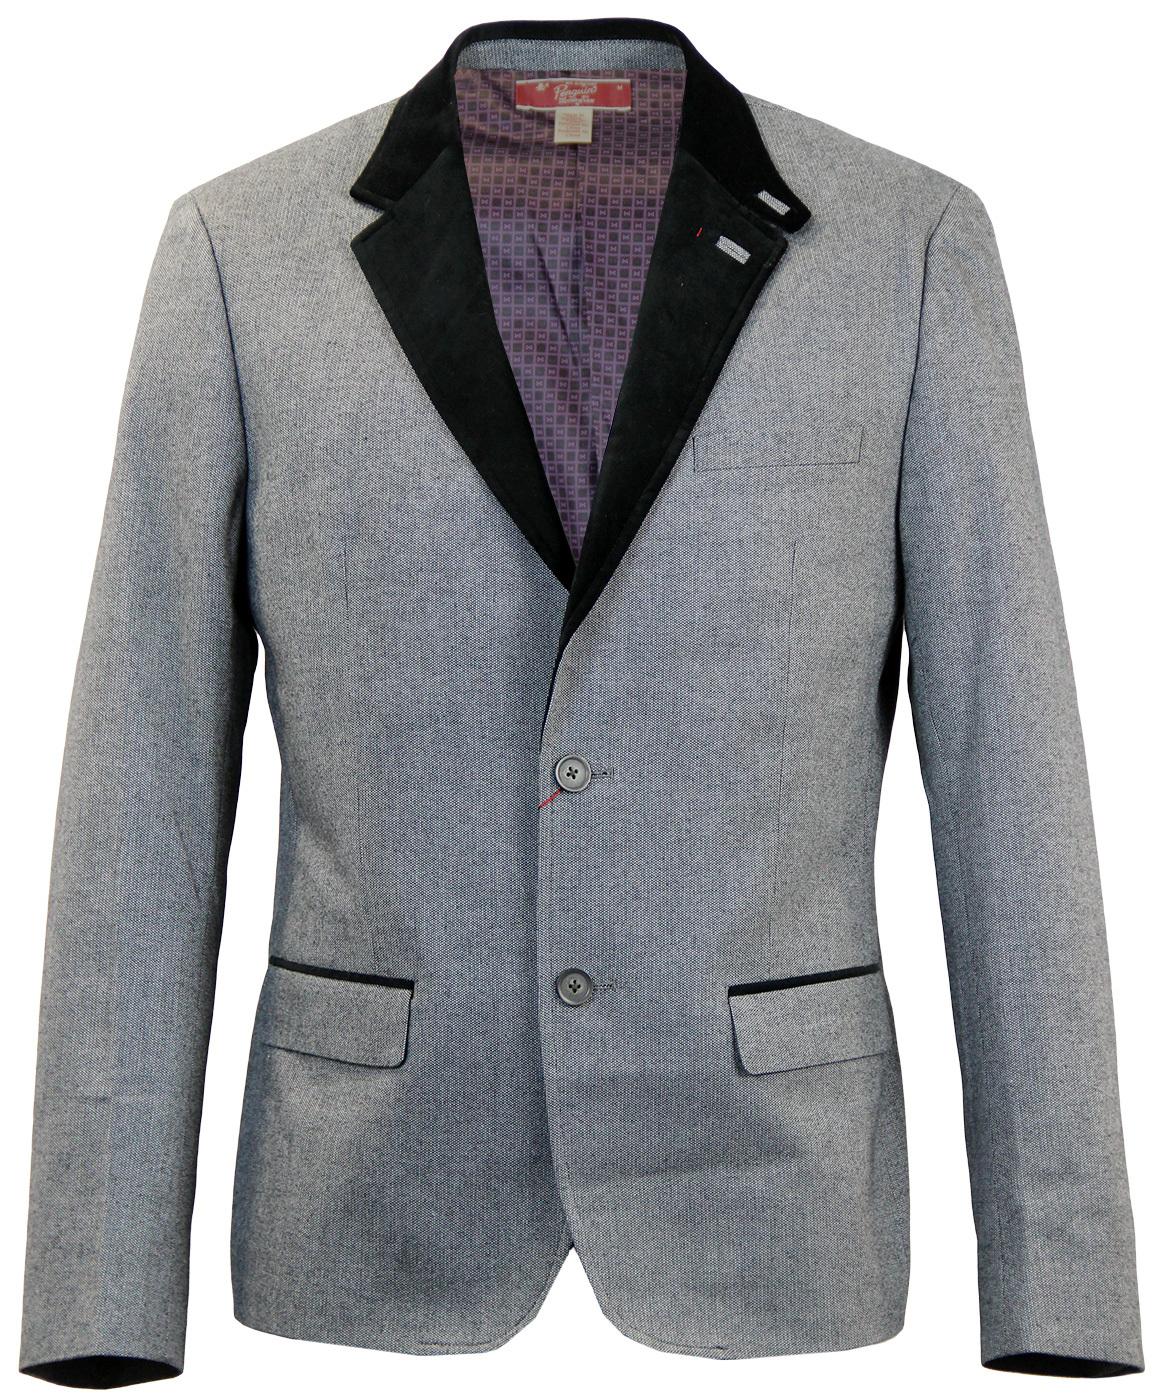 ORIGINAL PENGUIN Retro Mod Sixties Suit Jacket